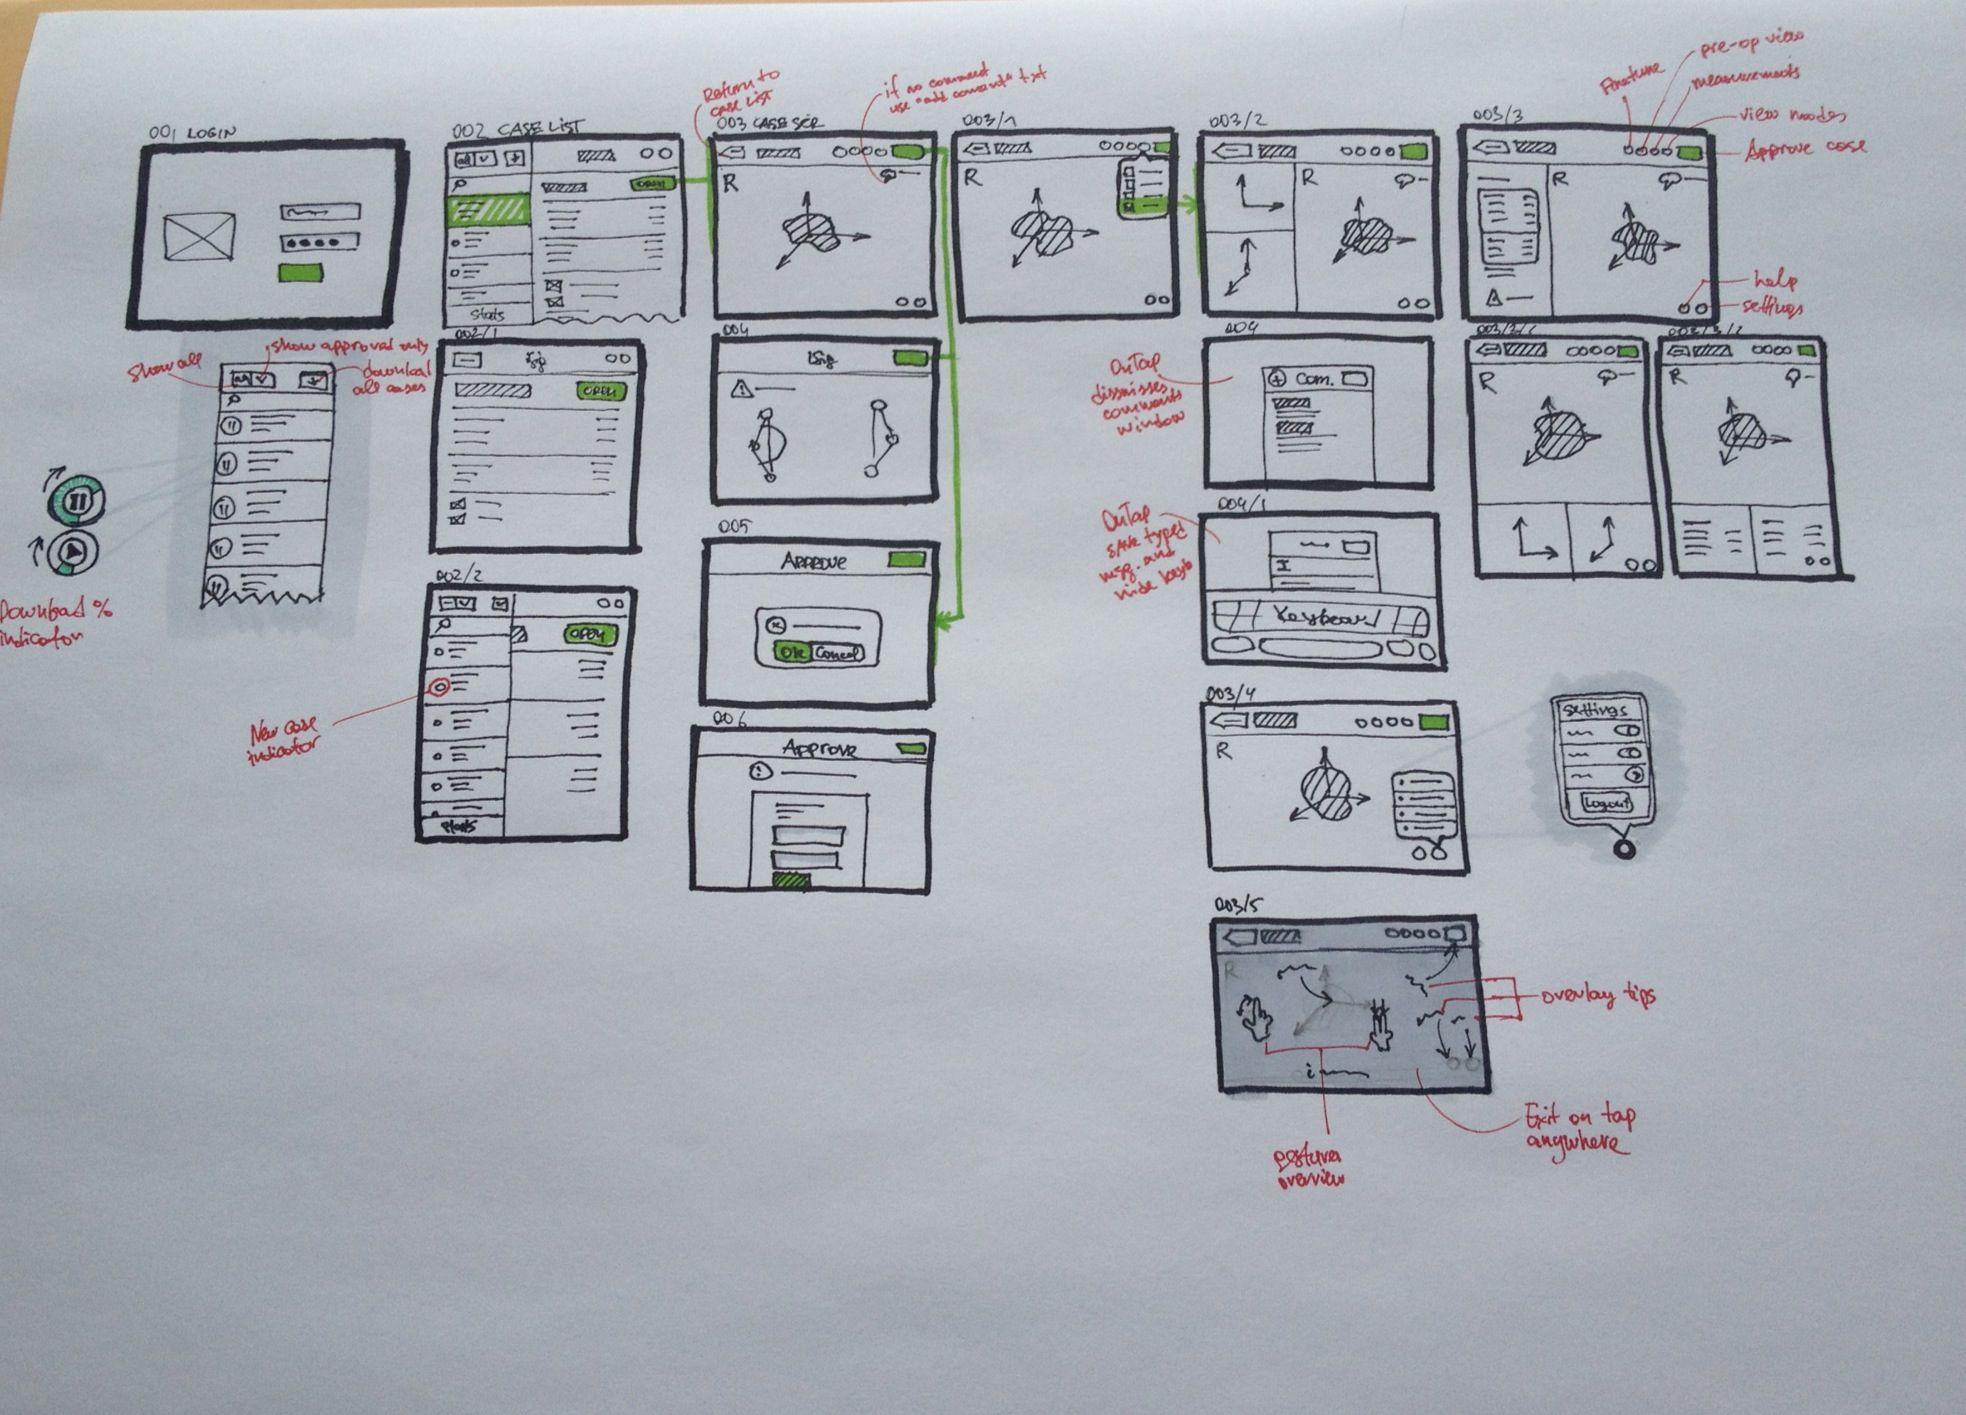 Screenflow sketching. UX, UI design | layout, Wireframe, Information ...